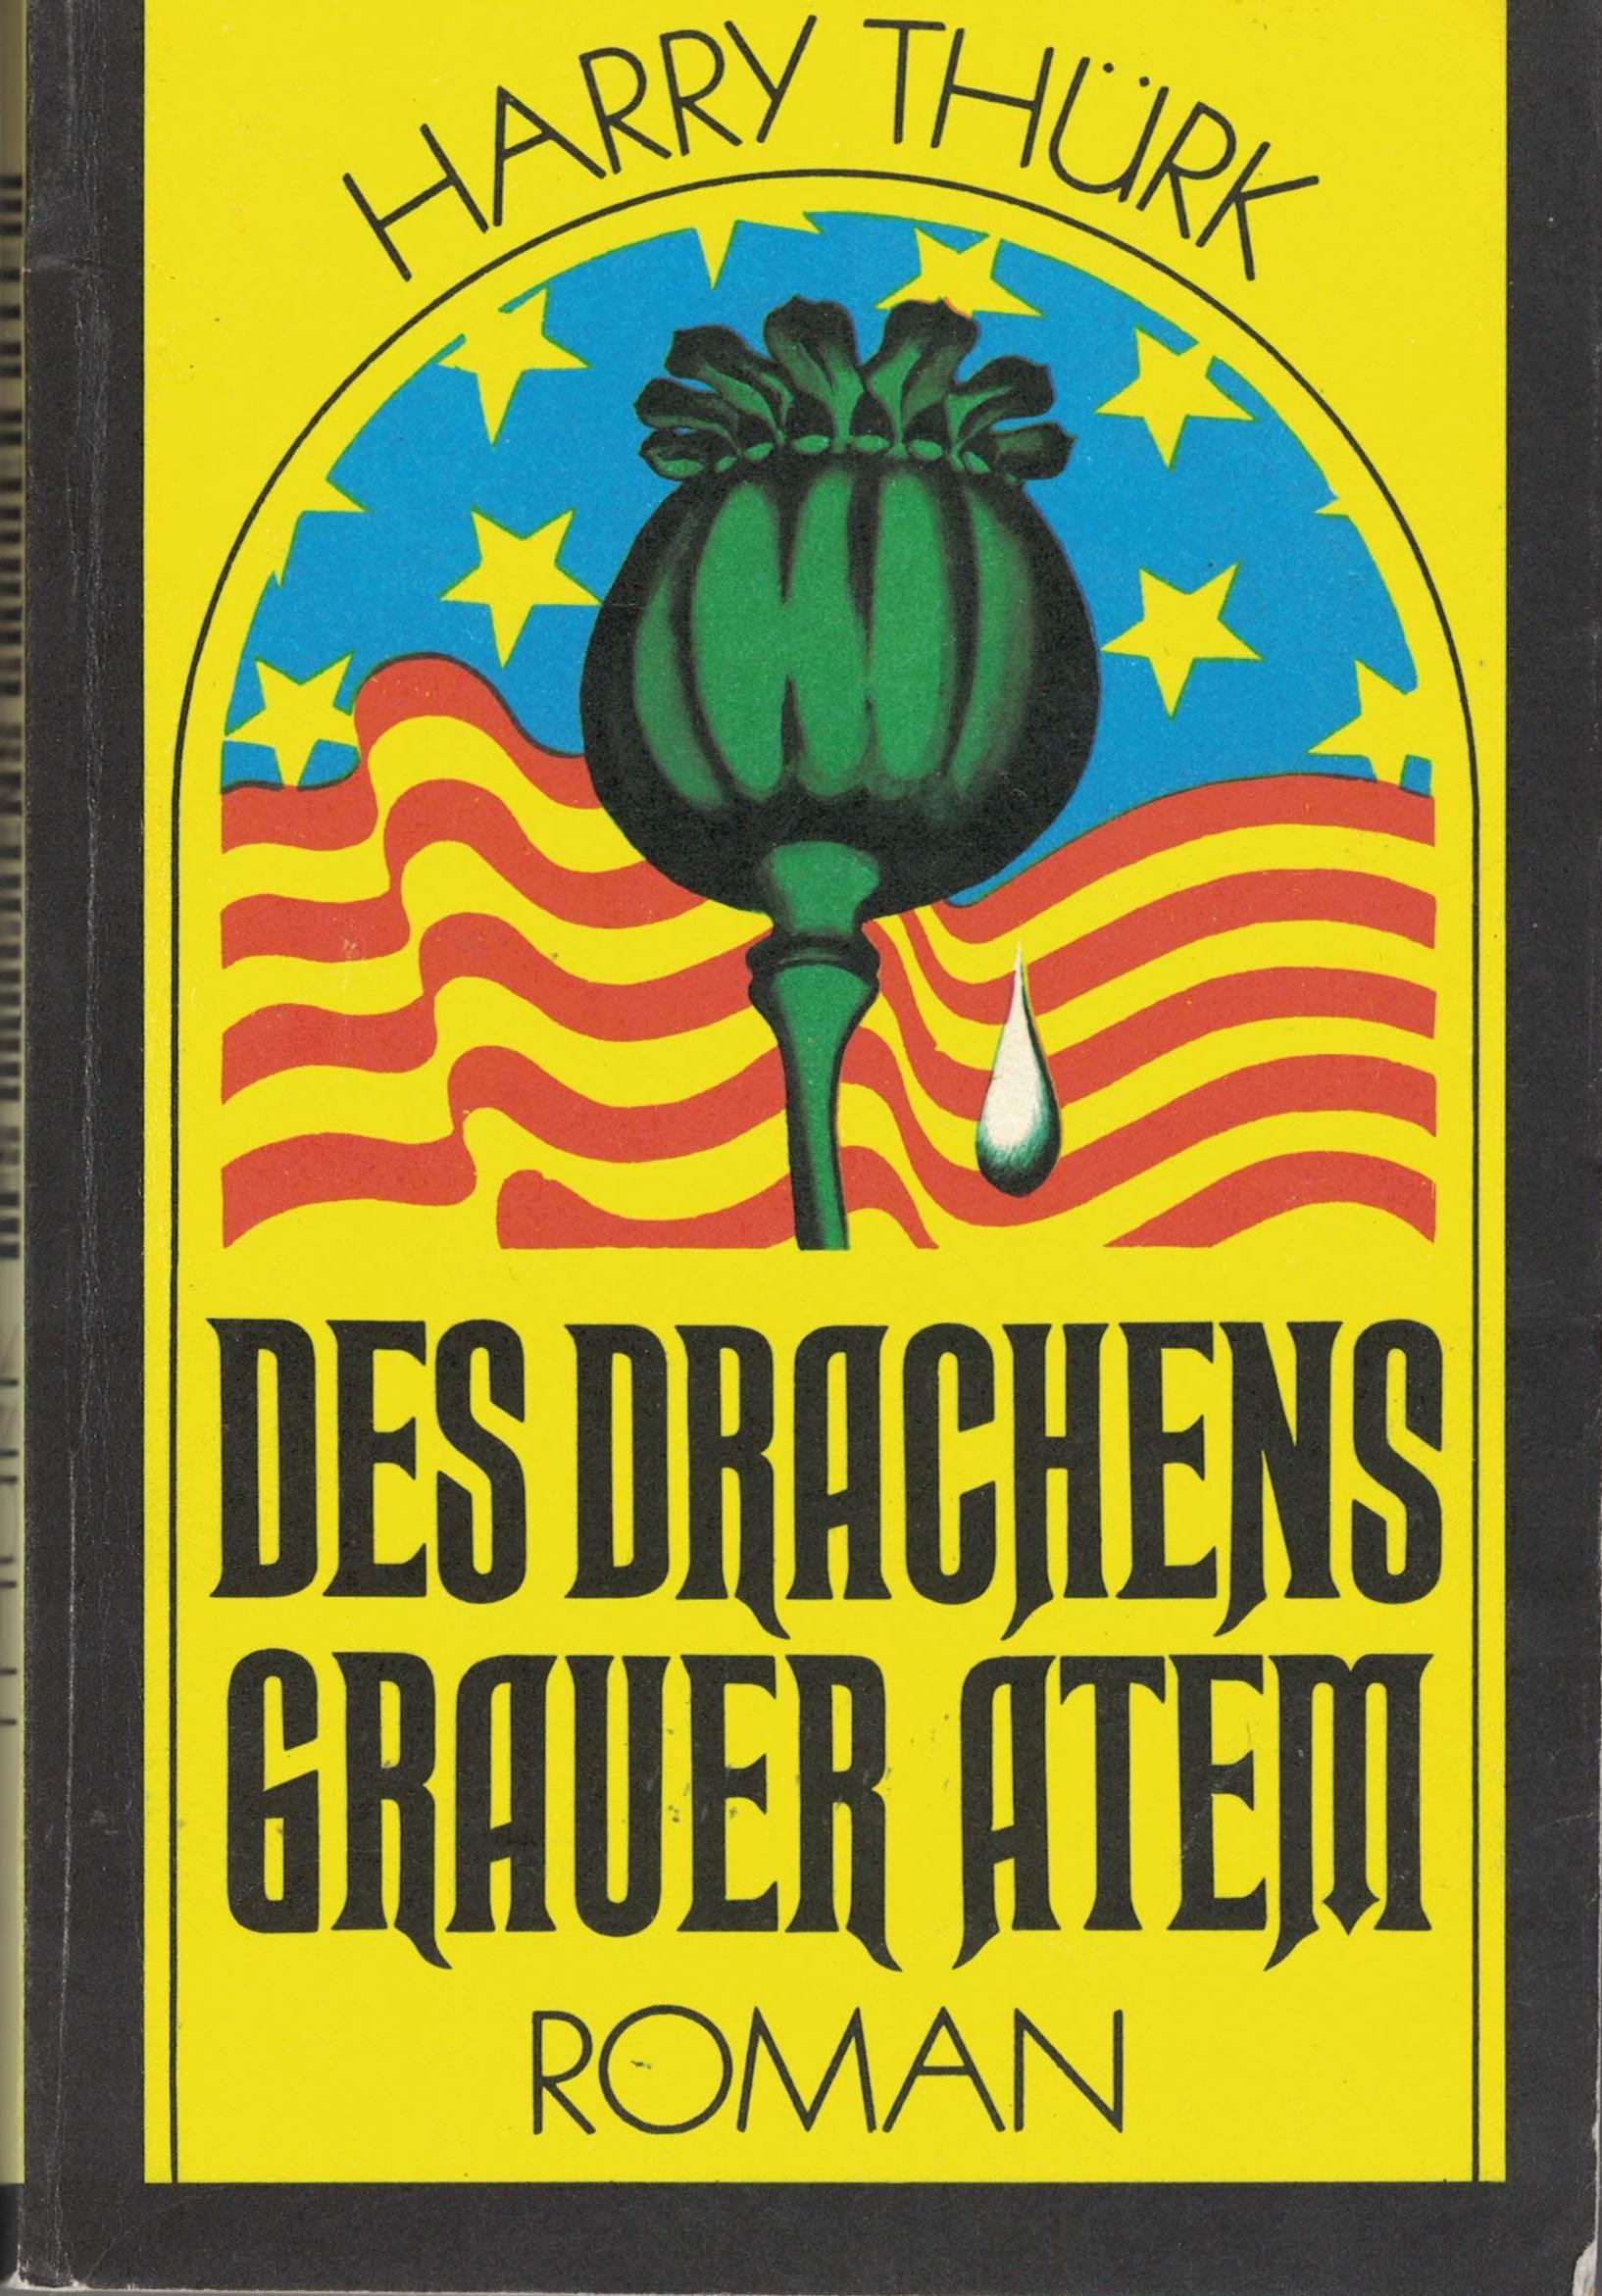 Harry Thürk - Des Drachens grauer Atem - Roman